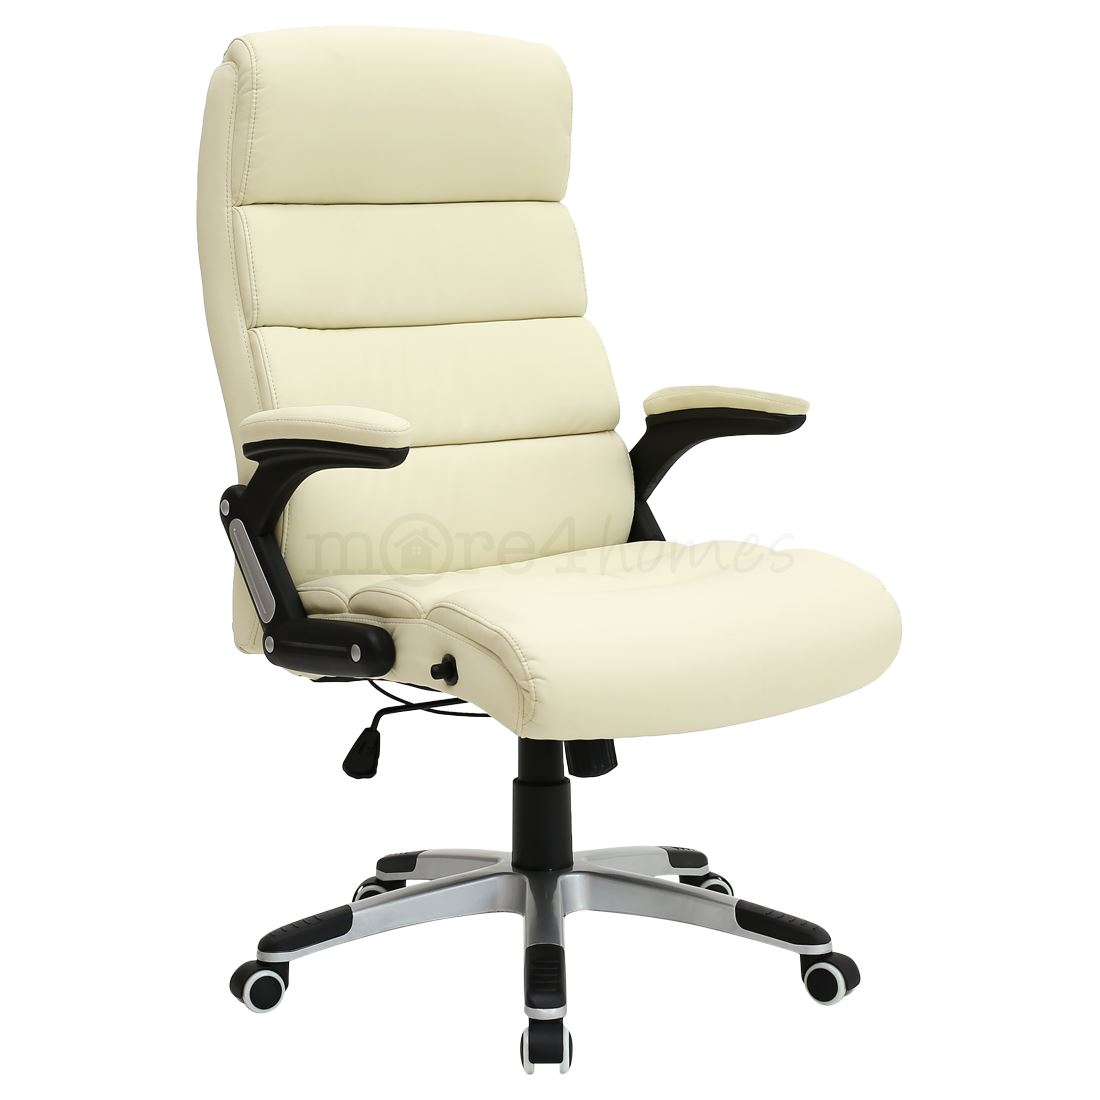 Havana Luxury Reclining Executive Leather Office Desk Chair High Back Swivel